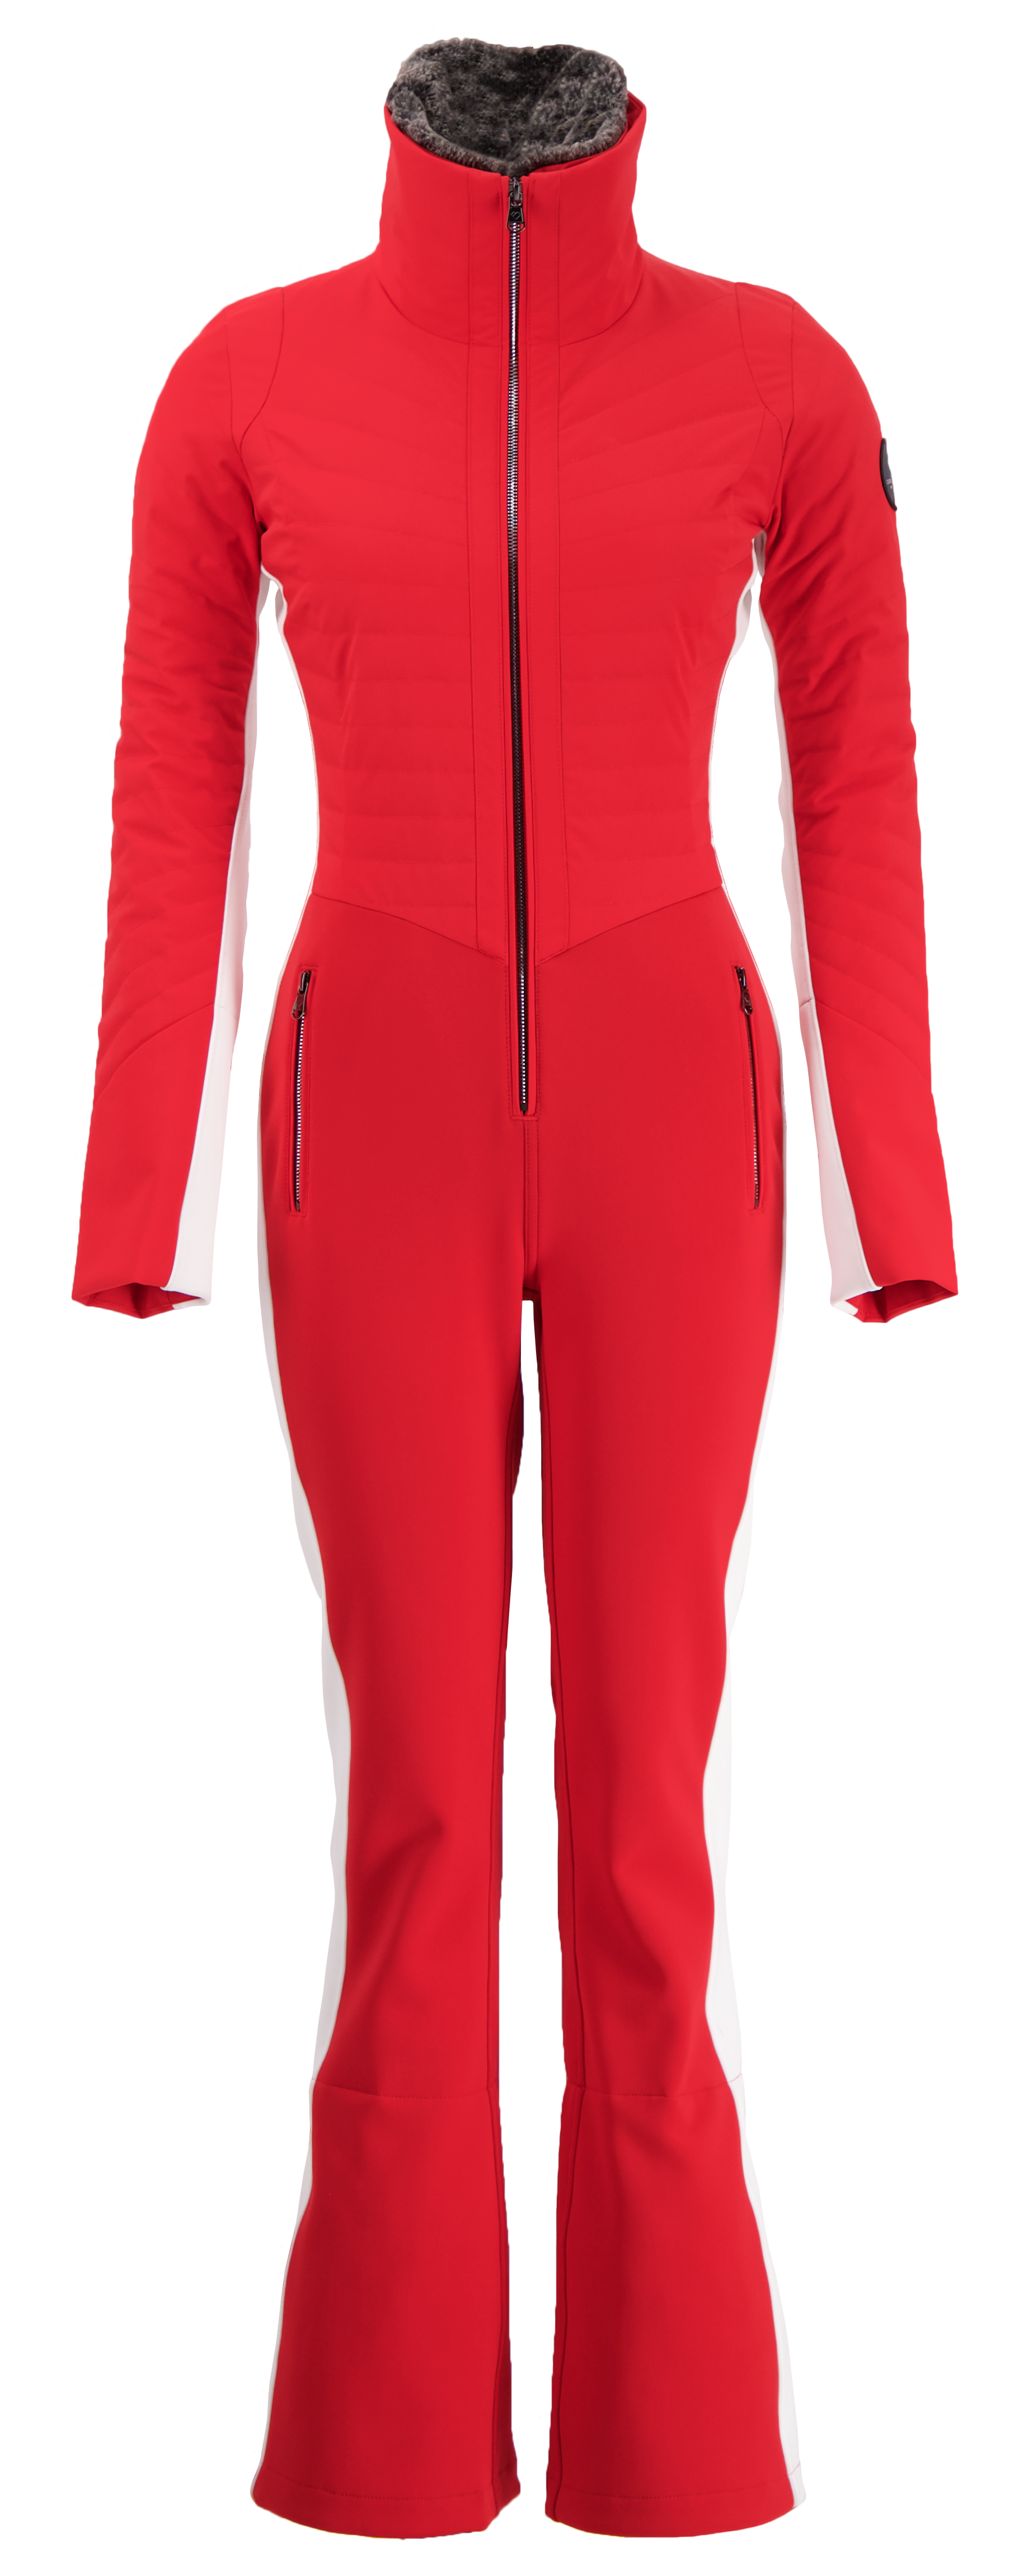 2021 Atomic Backland 107 W Women's Deep Snow Ski thumb